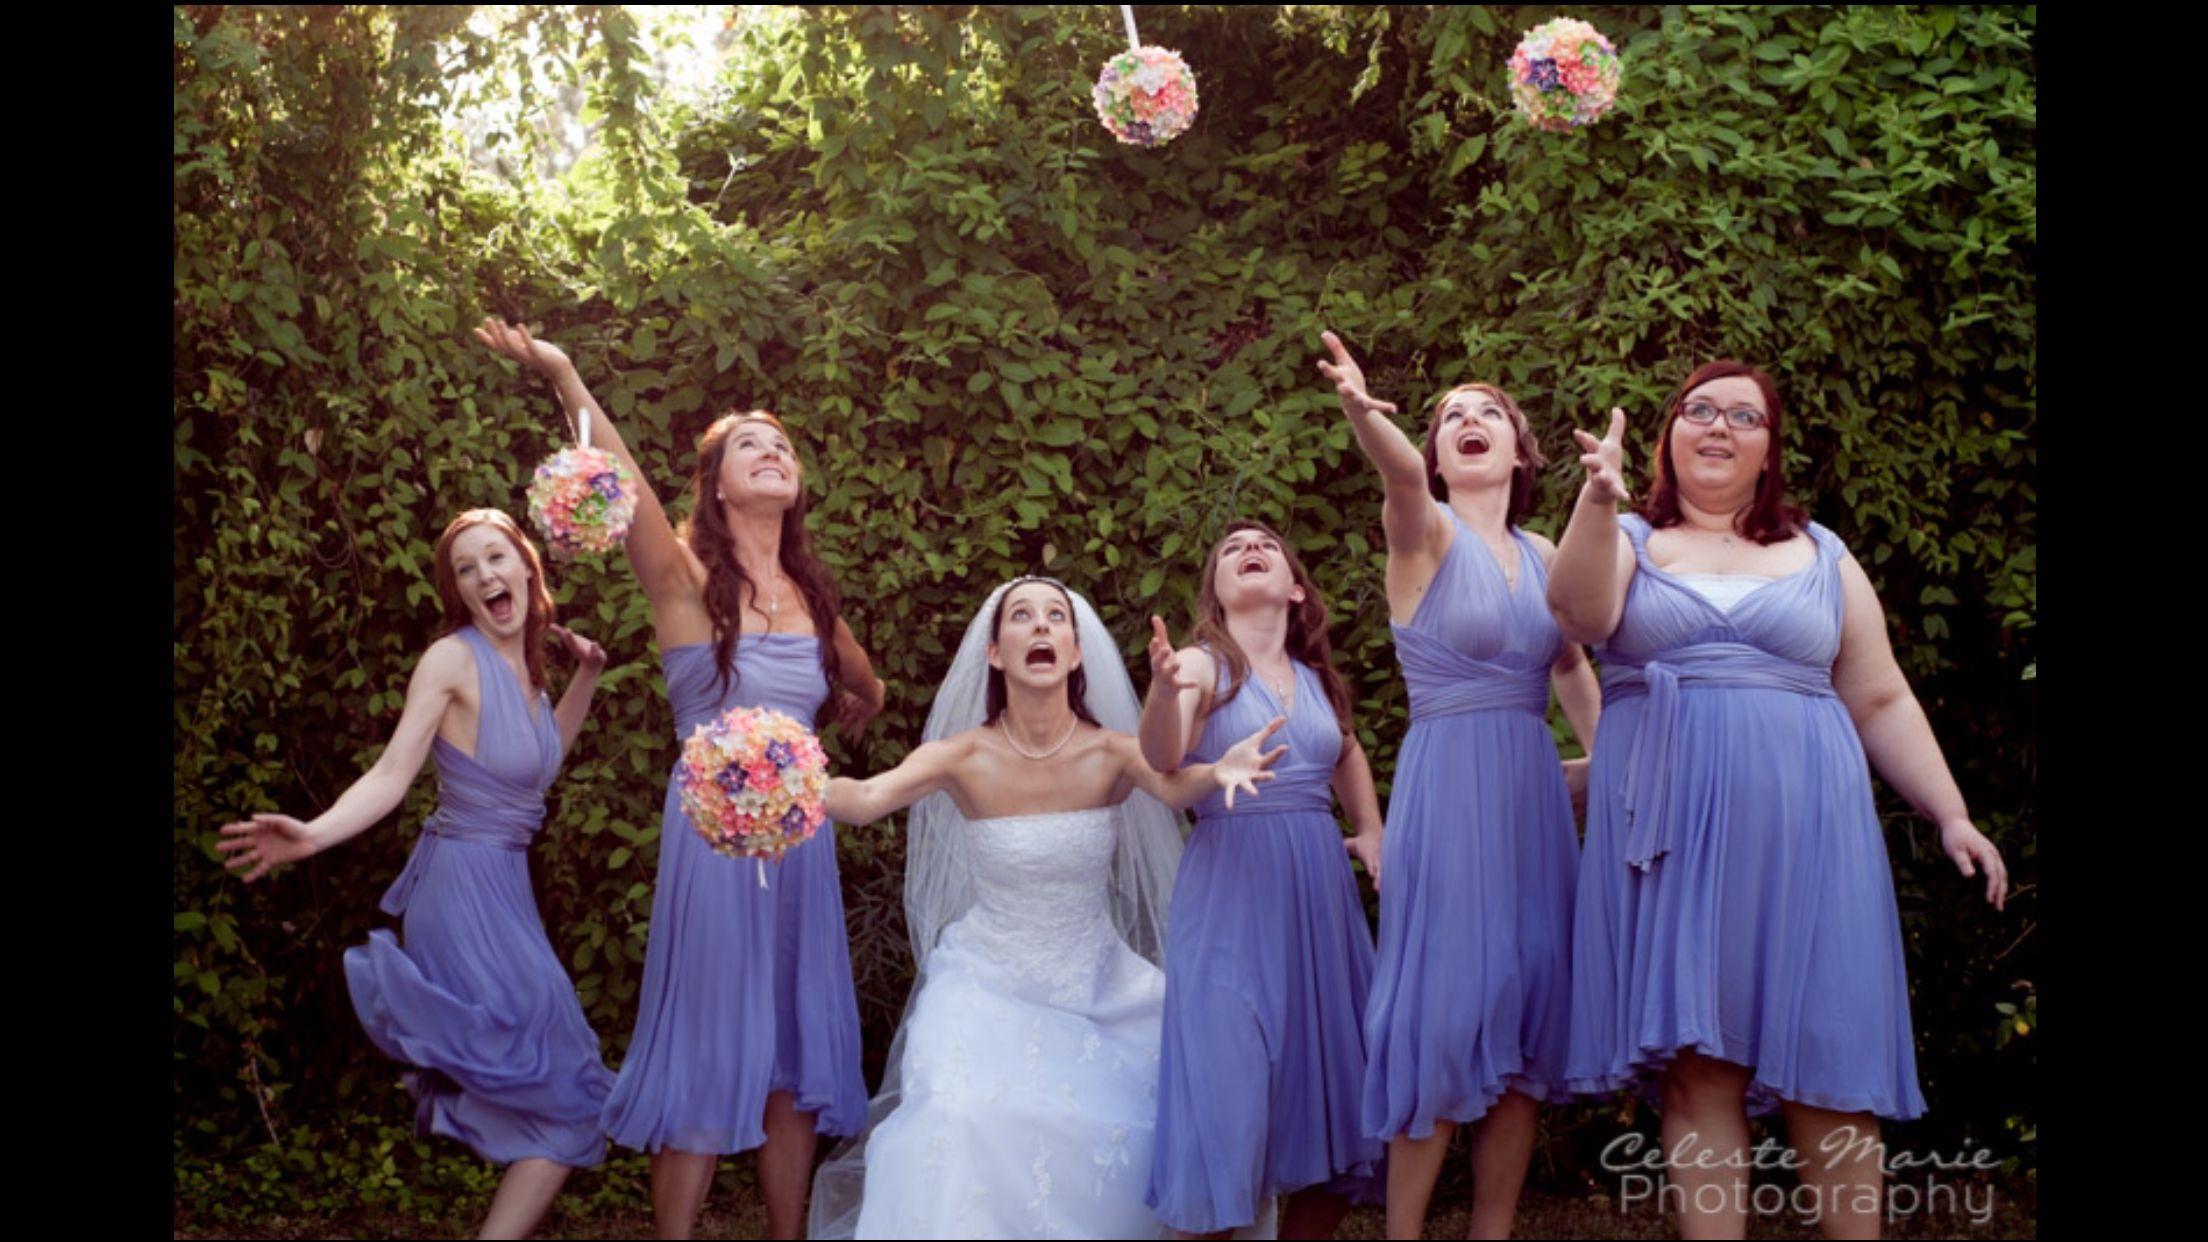 Hilarious bridesmaid photo wedding ideas pinterest weddings hilarious bridesmaid photo ombrellifo Choice Image